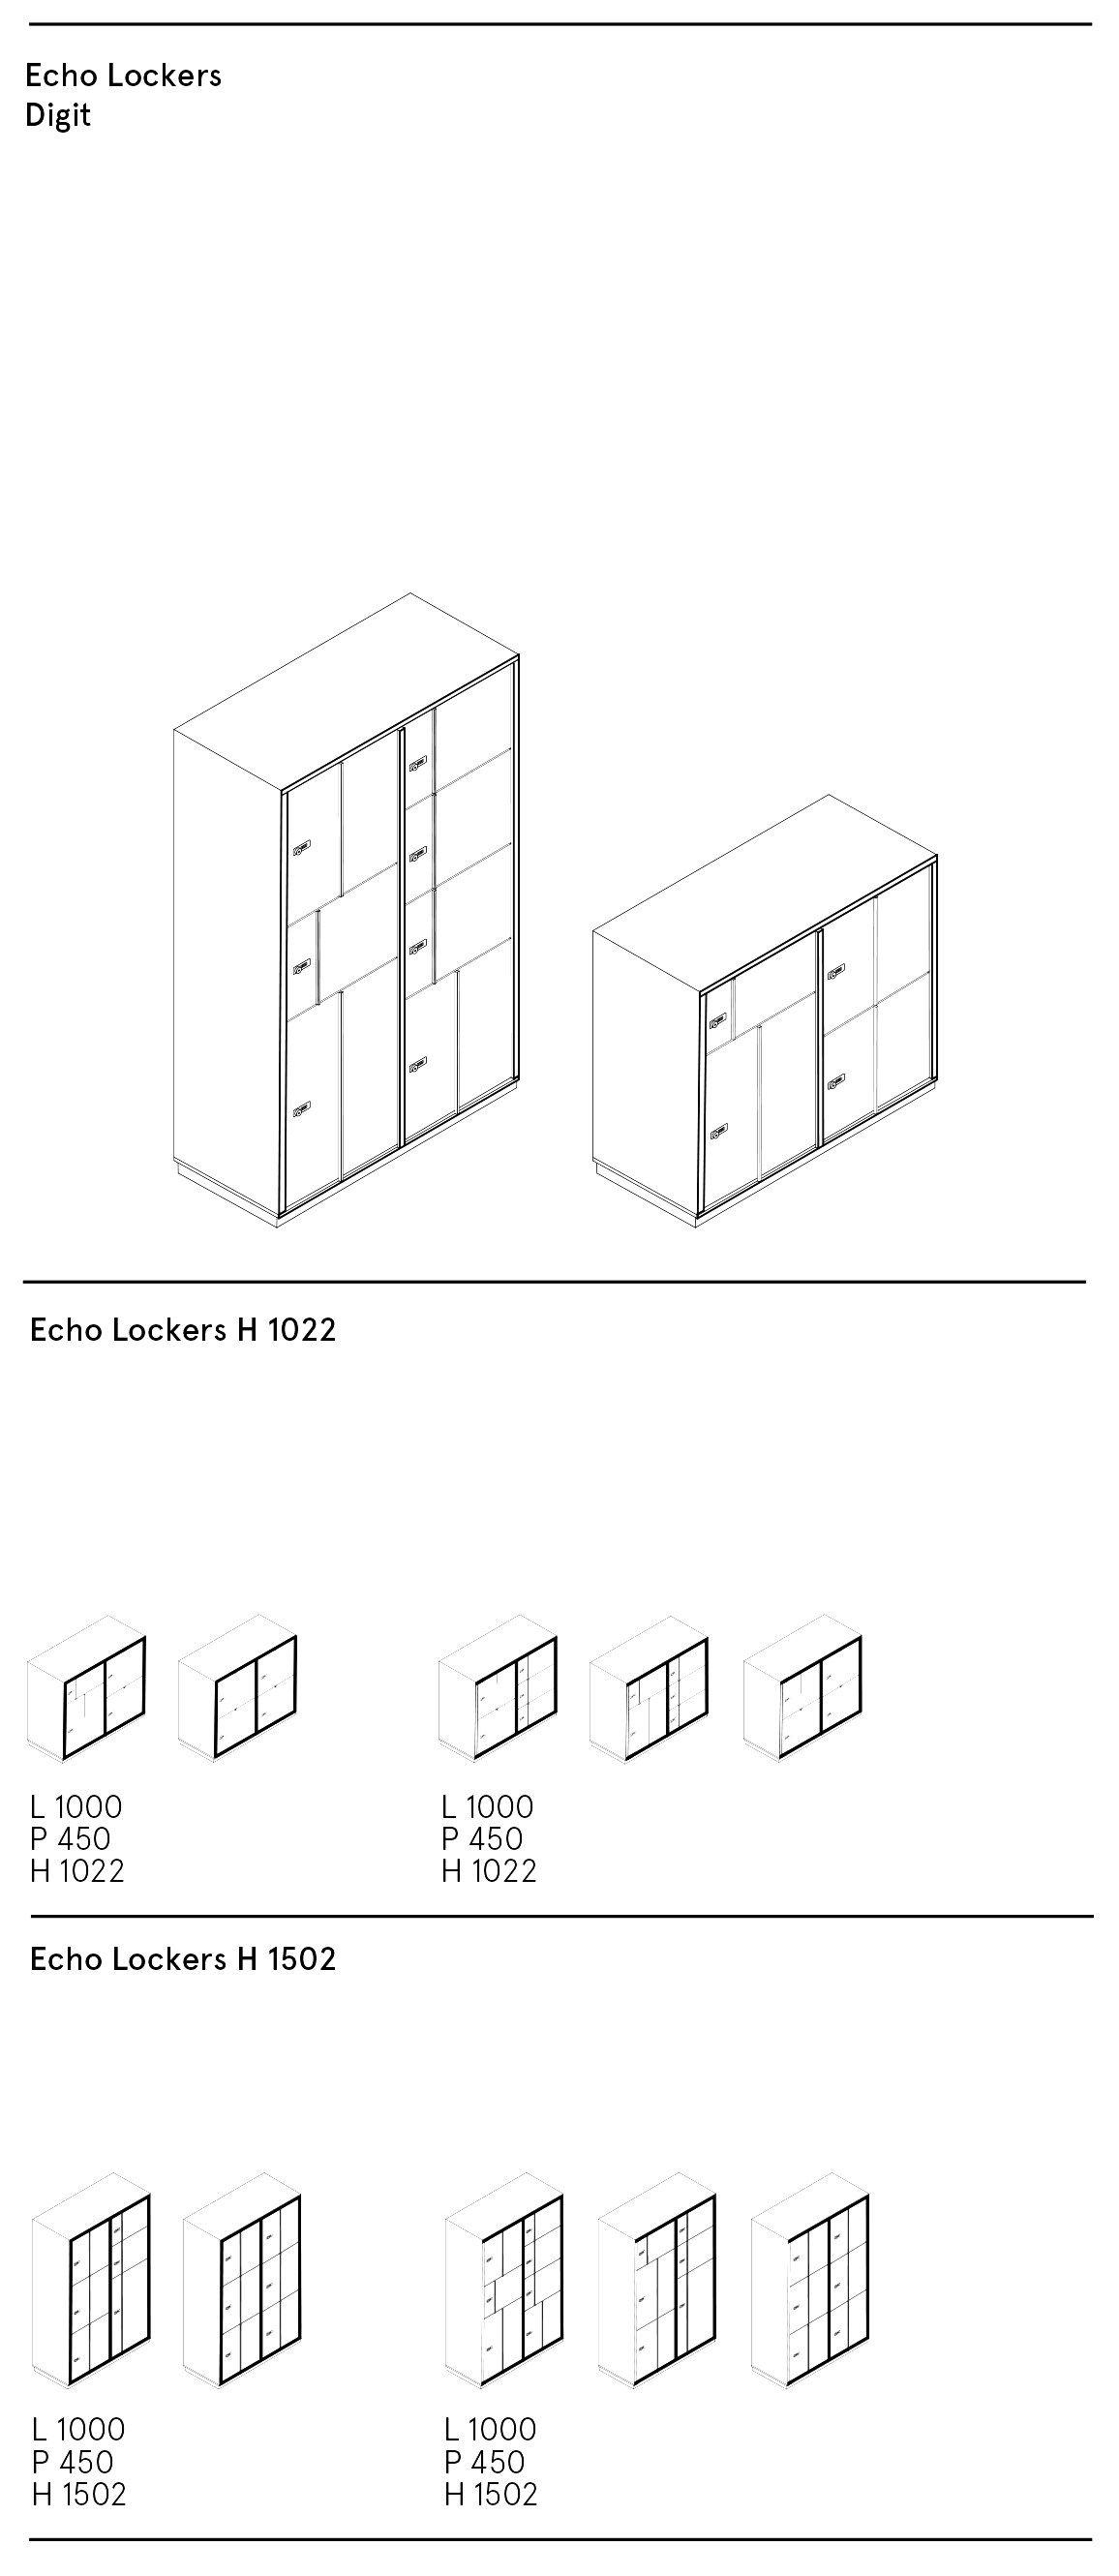 ECHO LOCKERS - Digit